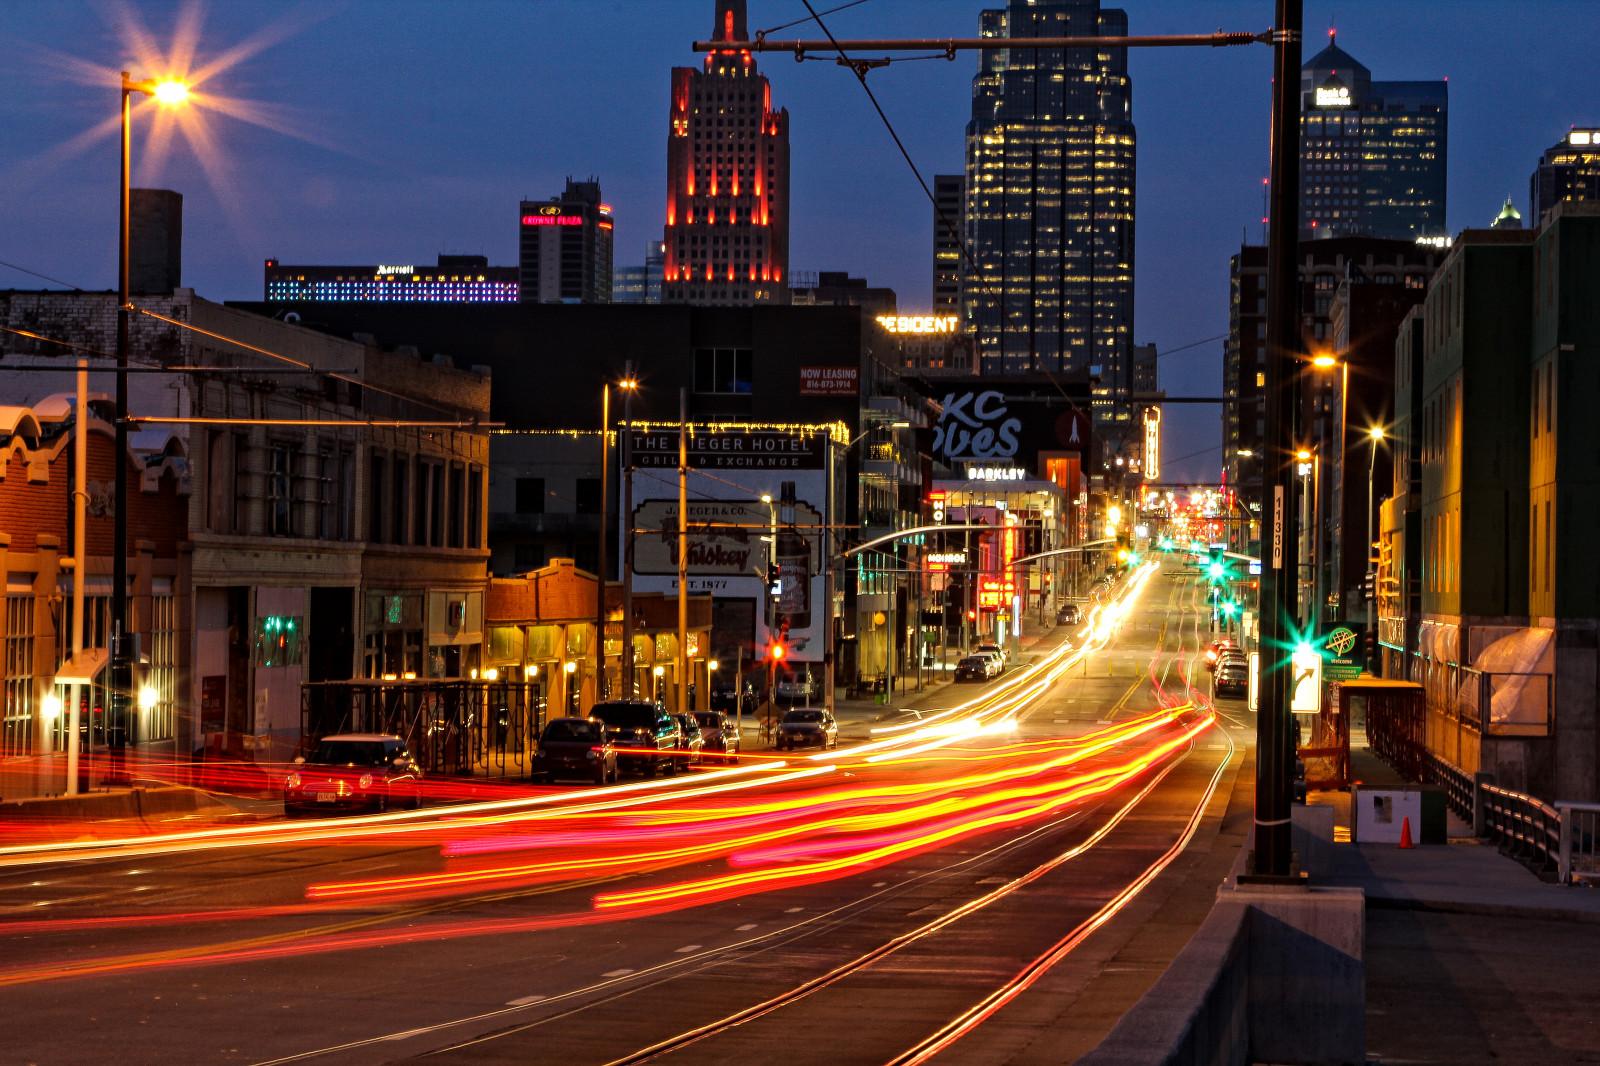 hintergrundbilder beleuchtung sonnenuntergang stadt stra e stadtbild nacht neon auto. Black Bedroom Furniture Sets. Home Design Ideas